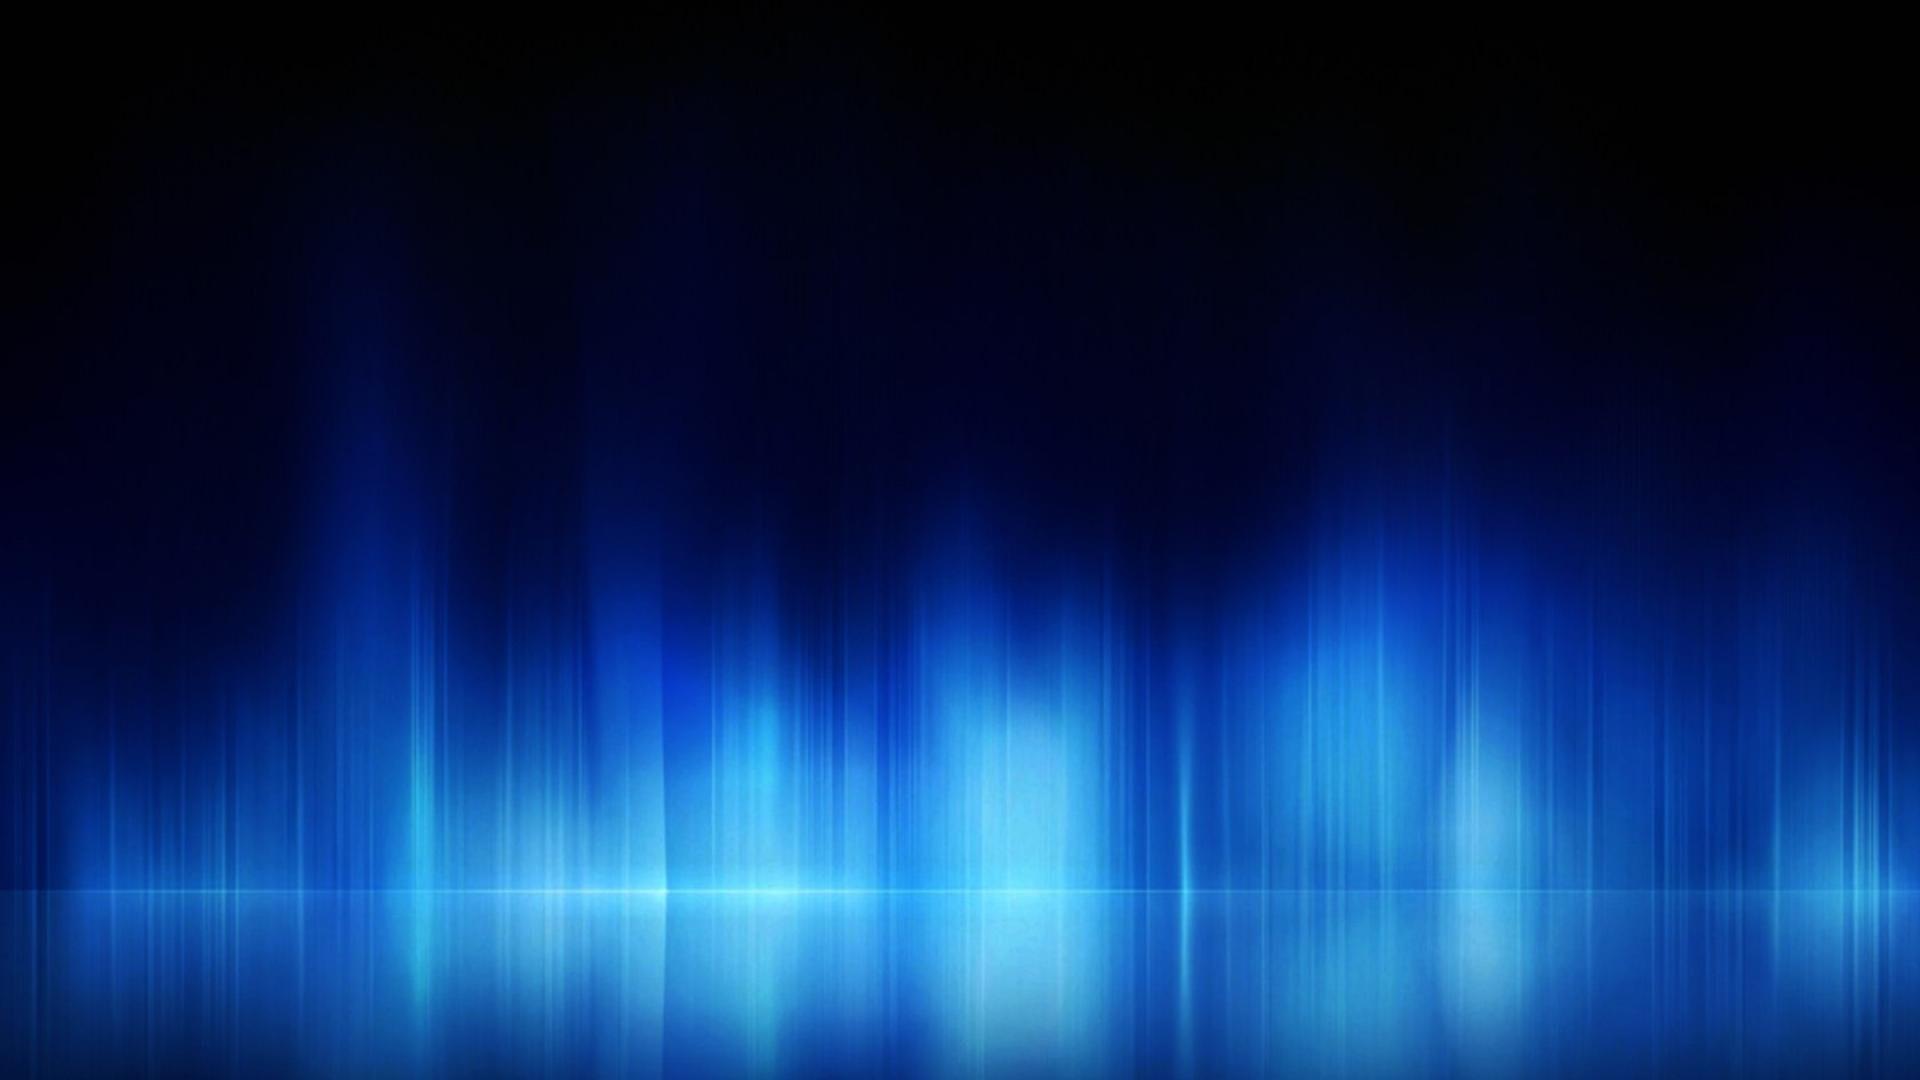 Dark Blue Abstract Background 812030